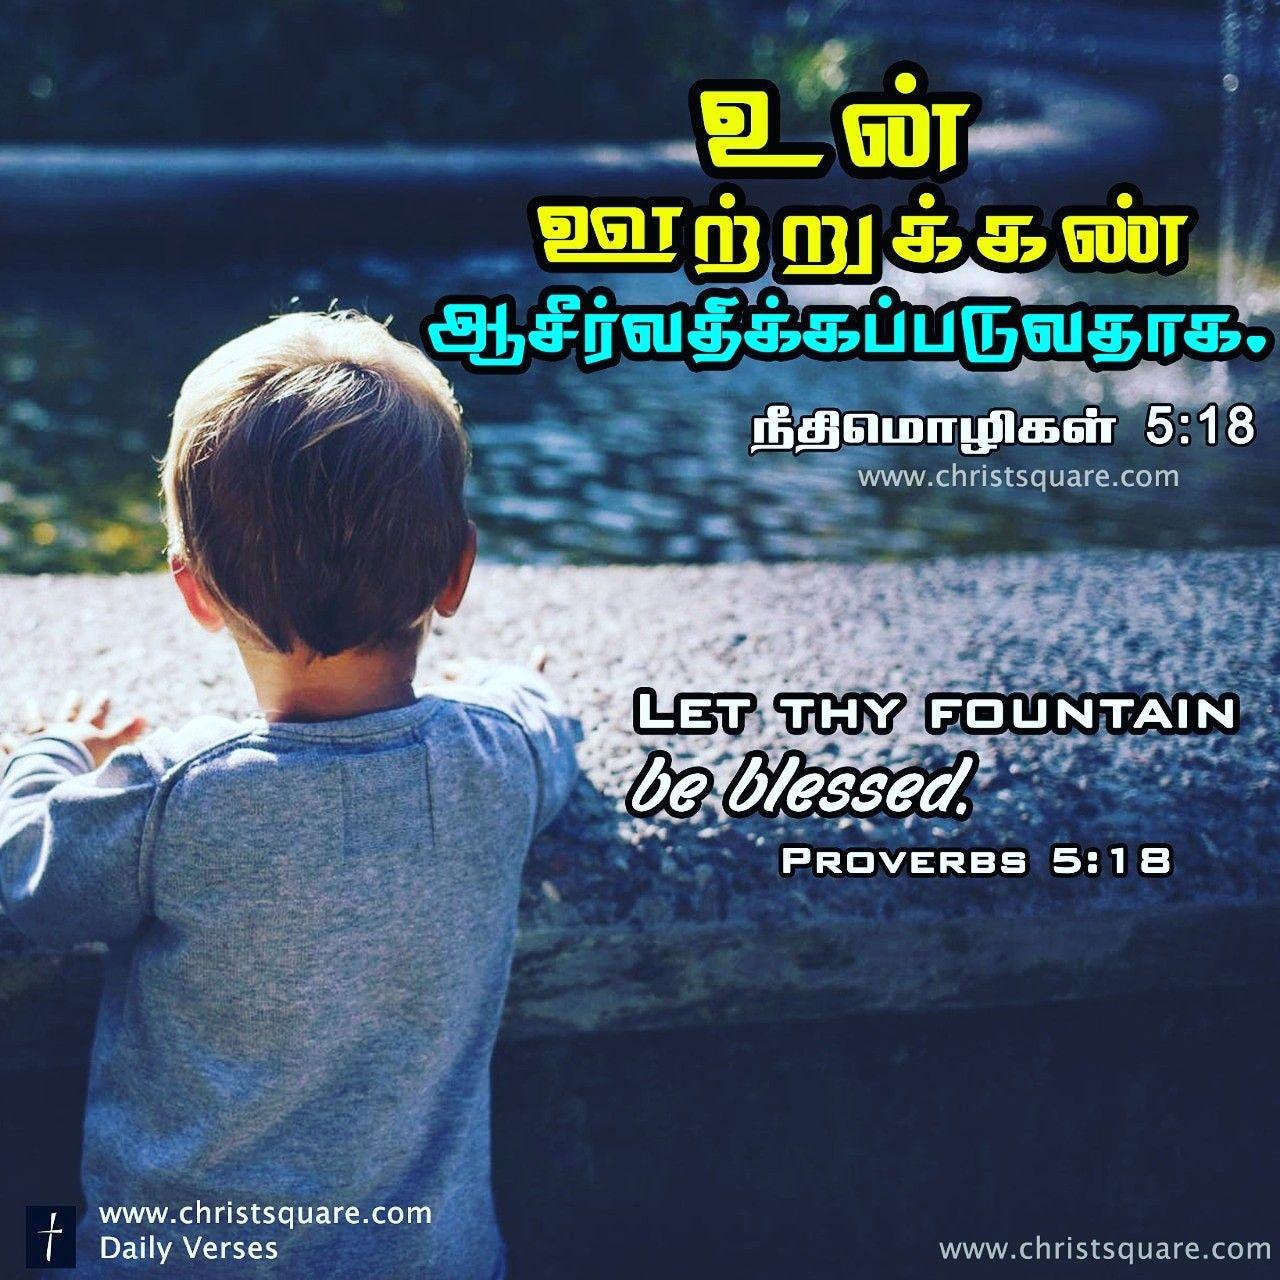 Tamil Christian Whatsapp Status Tamil Christian Whatsapp Dp Wallpaper Tamil Christian Wallpaper Hd Tamil Christian Words Christian Verses Bible Words Verses